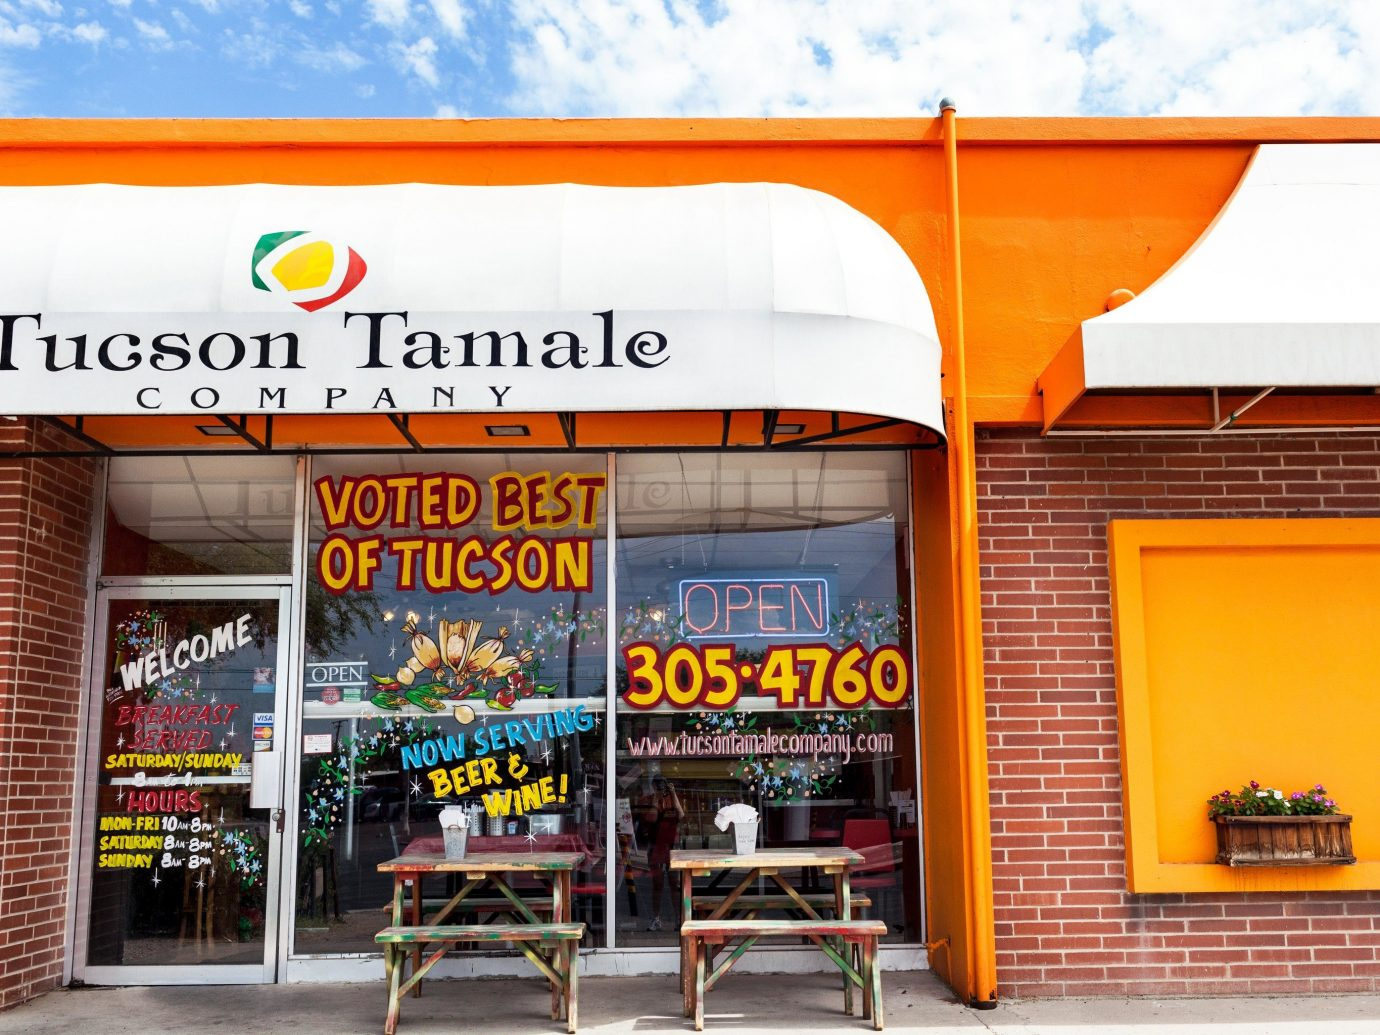 Budget Weekend Getaways outdoor fast food advertising retail interior design facade brand signage fast food restaurant window covering restaurant banner sign